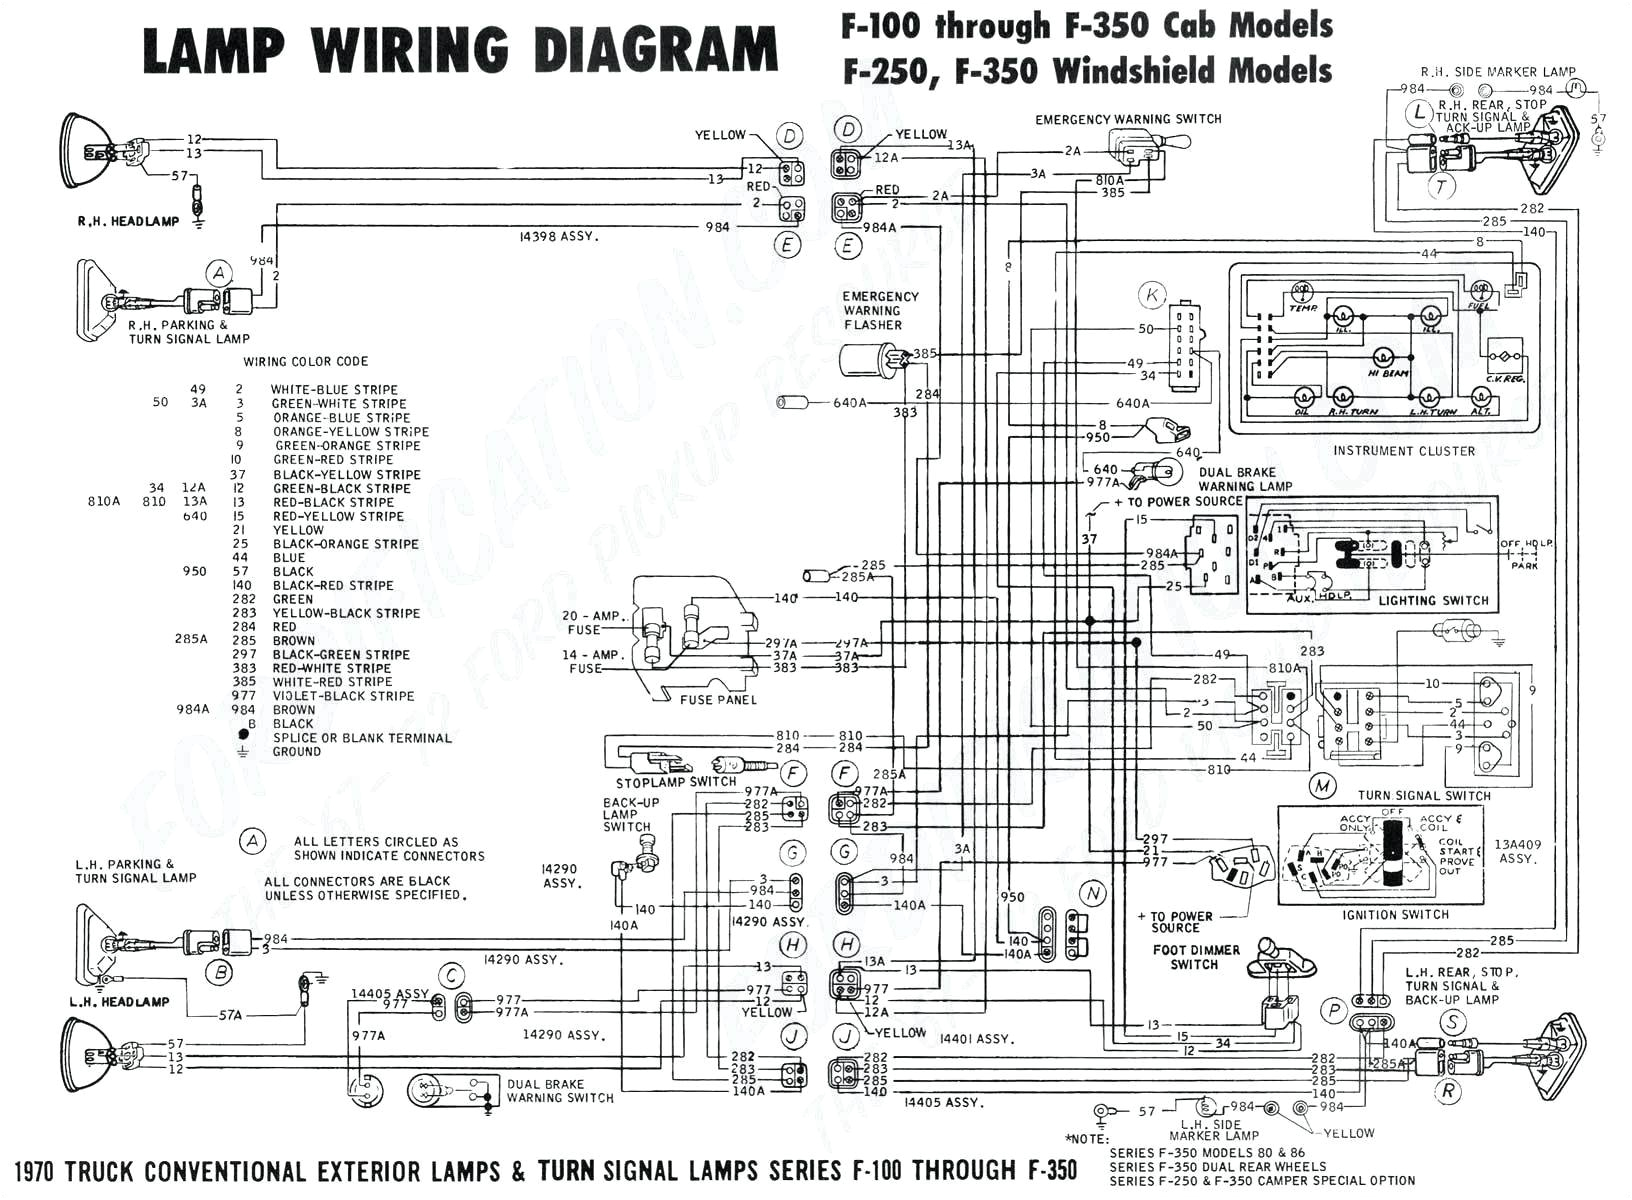 ouku car stereo wiring diagram data wiring diagram ouku double din wiringdiagram